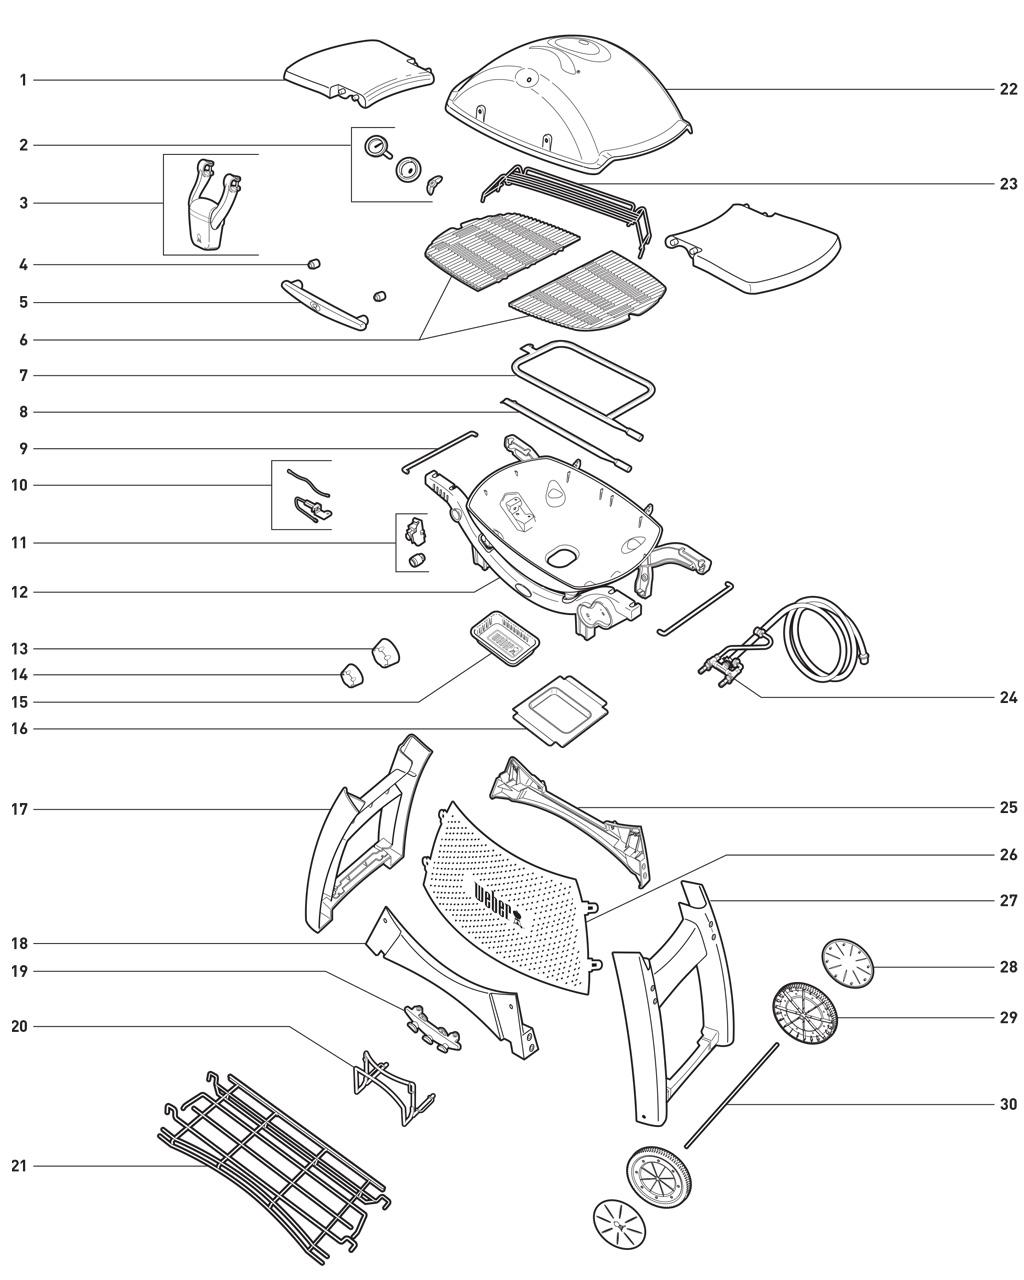 Schematic Image 57067001